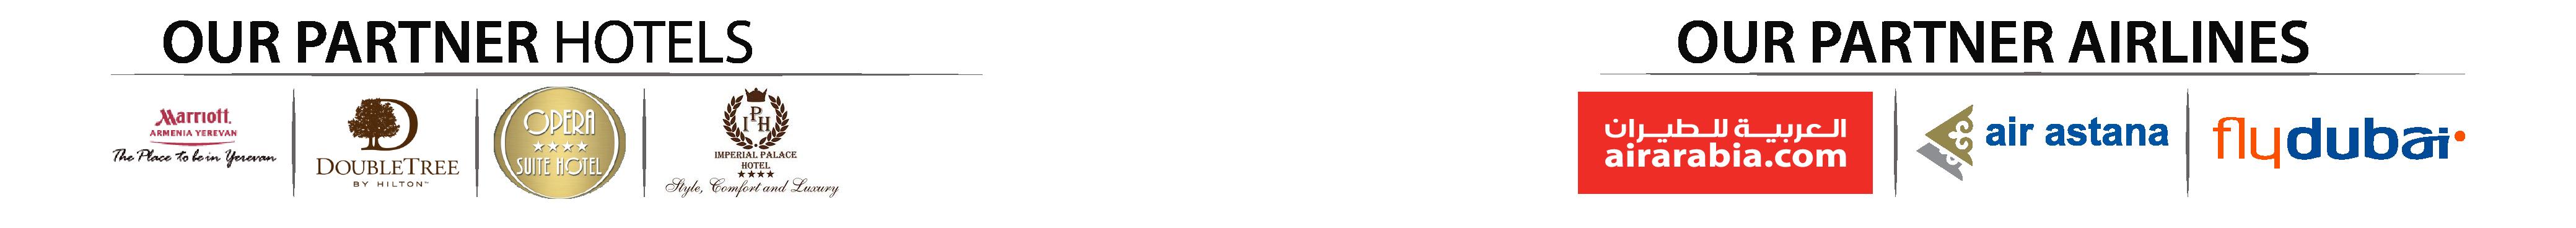 armenia partner